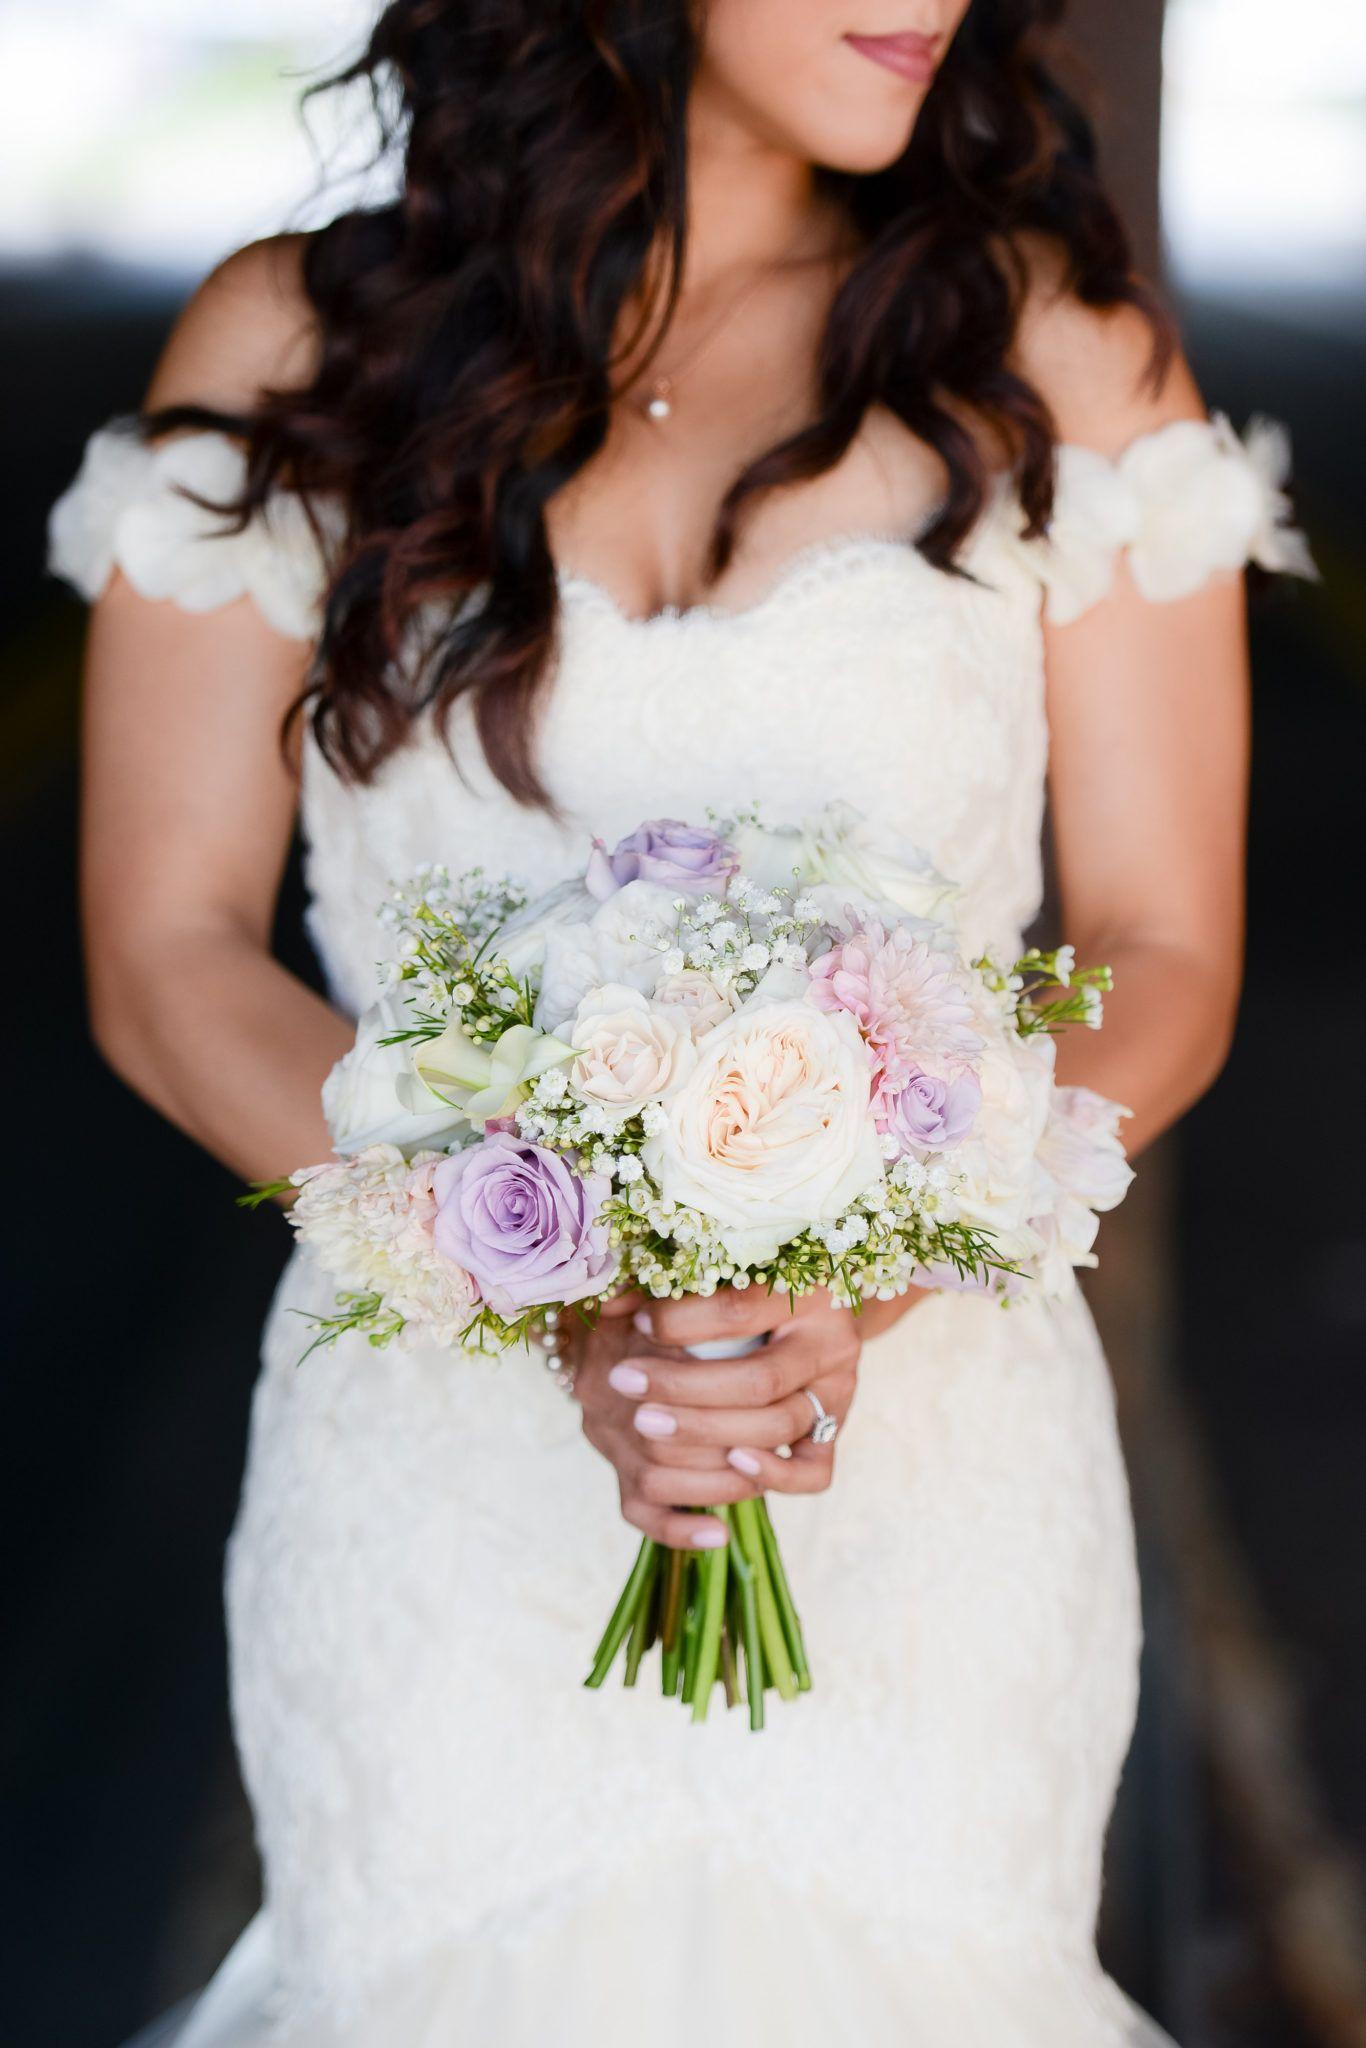 Elena + Fabian's Industrial Wedding | Dress: Lea-Ann Belter Rosemary via MH Pomander's | Image: Sara Ackerman Photography | Venue: Mavris Arts and Events Center